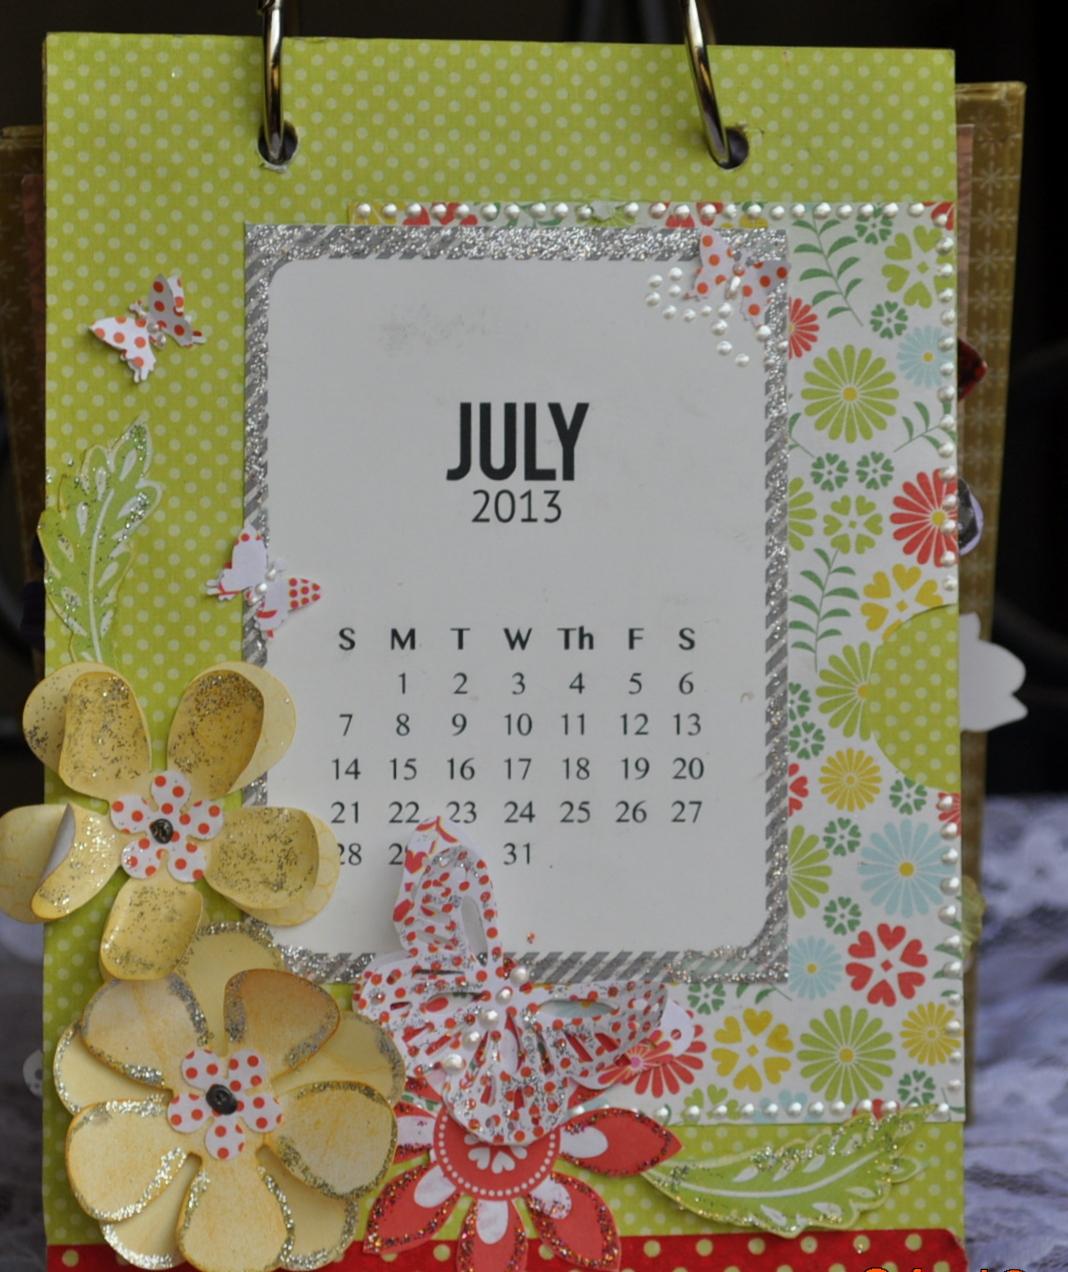 Handmade Calendar With Photos : Dazzled by life handmade desk calendar